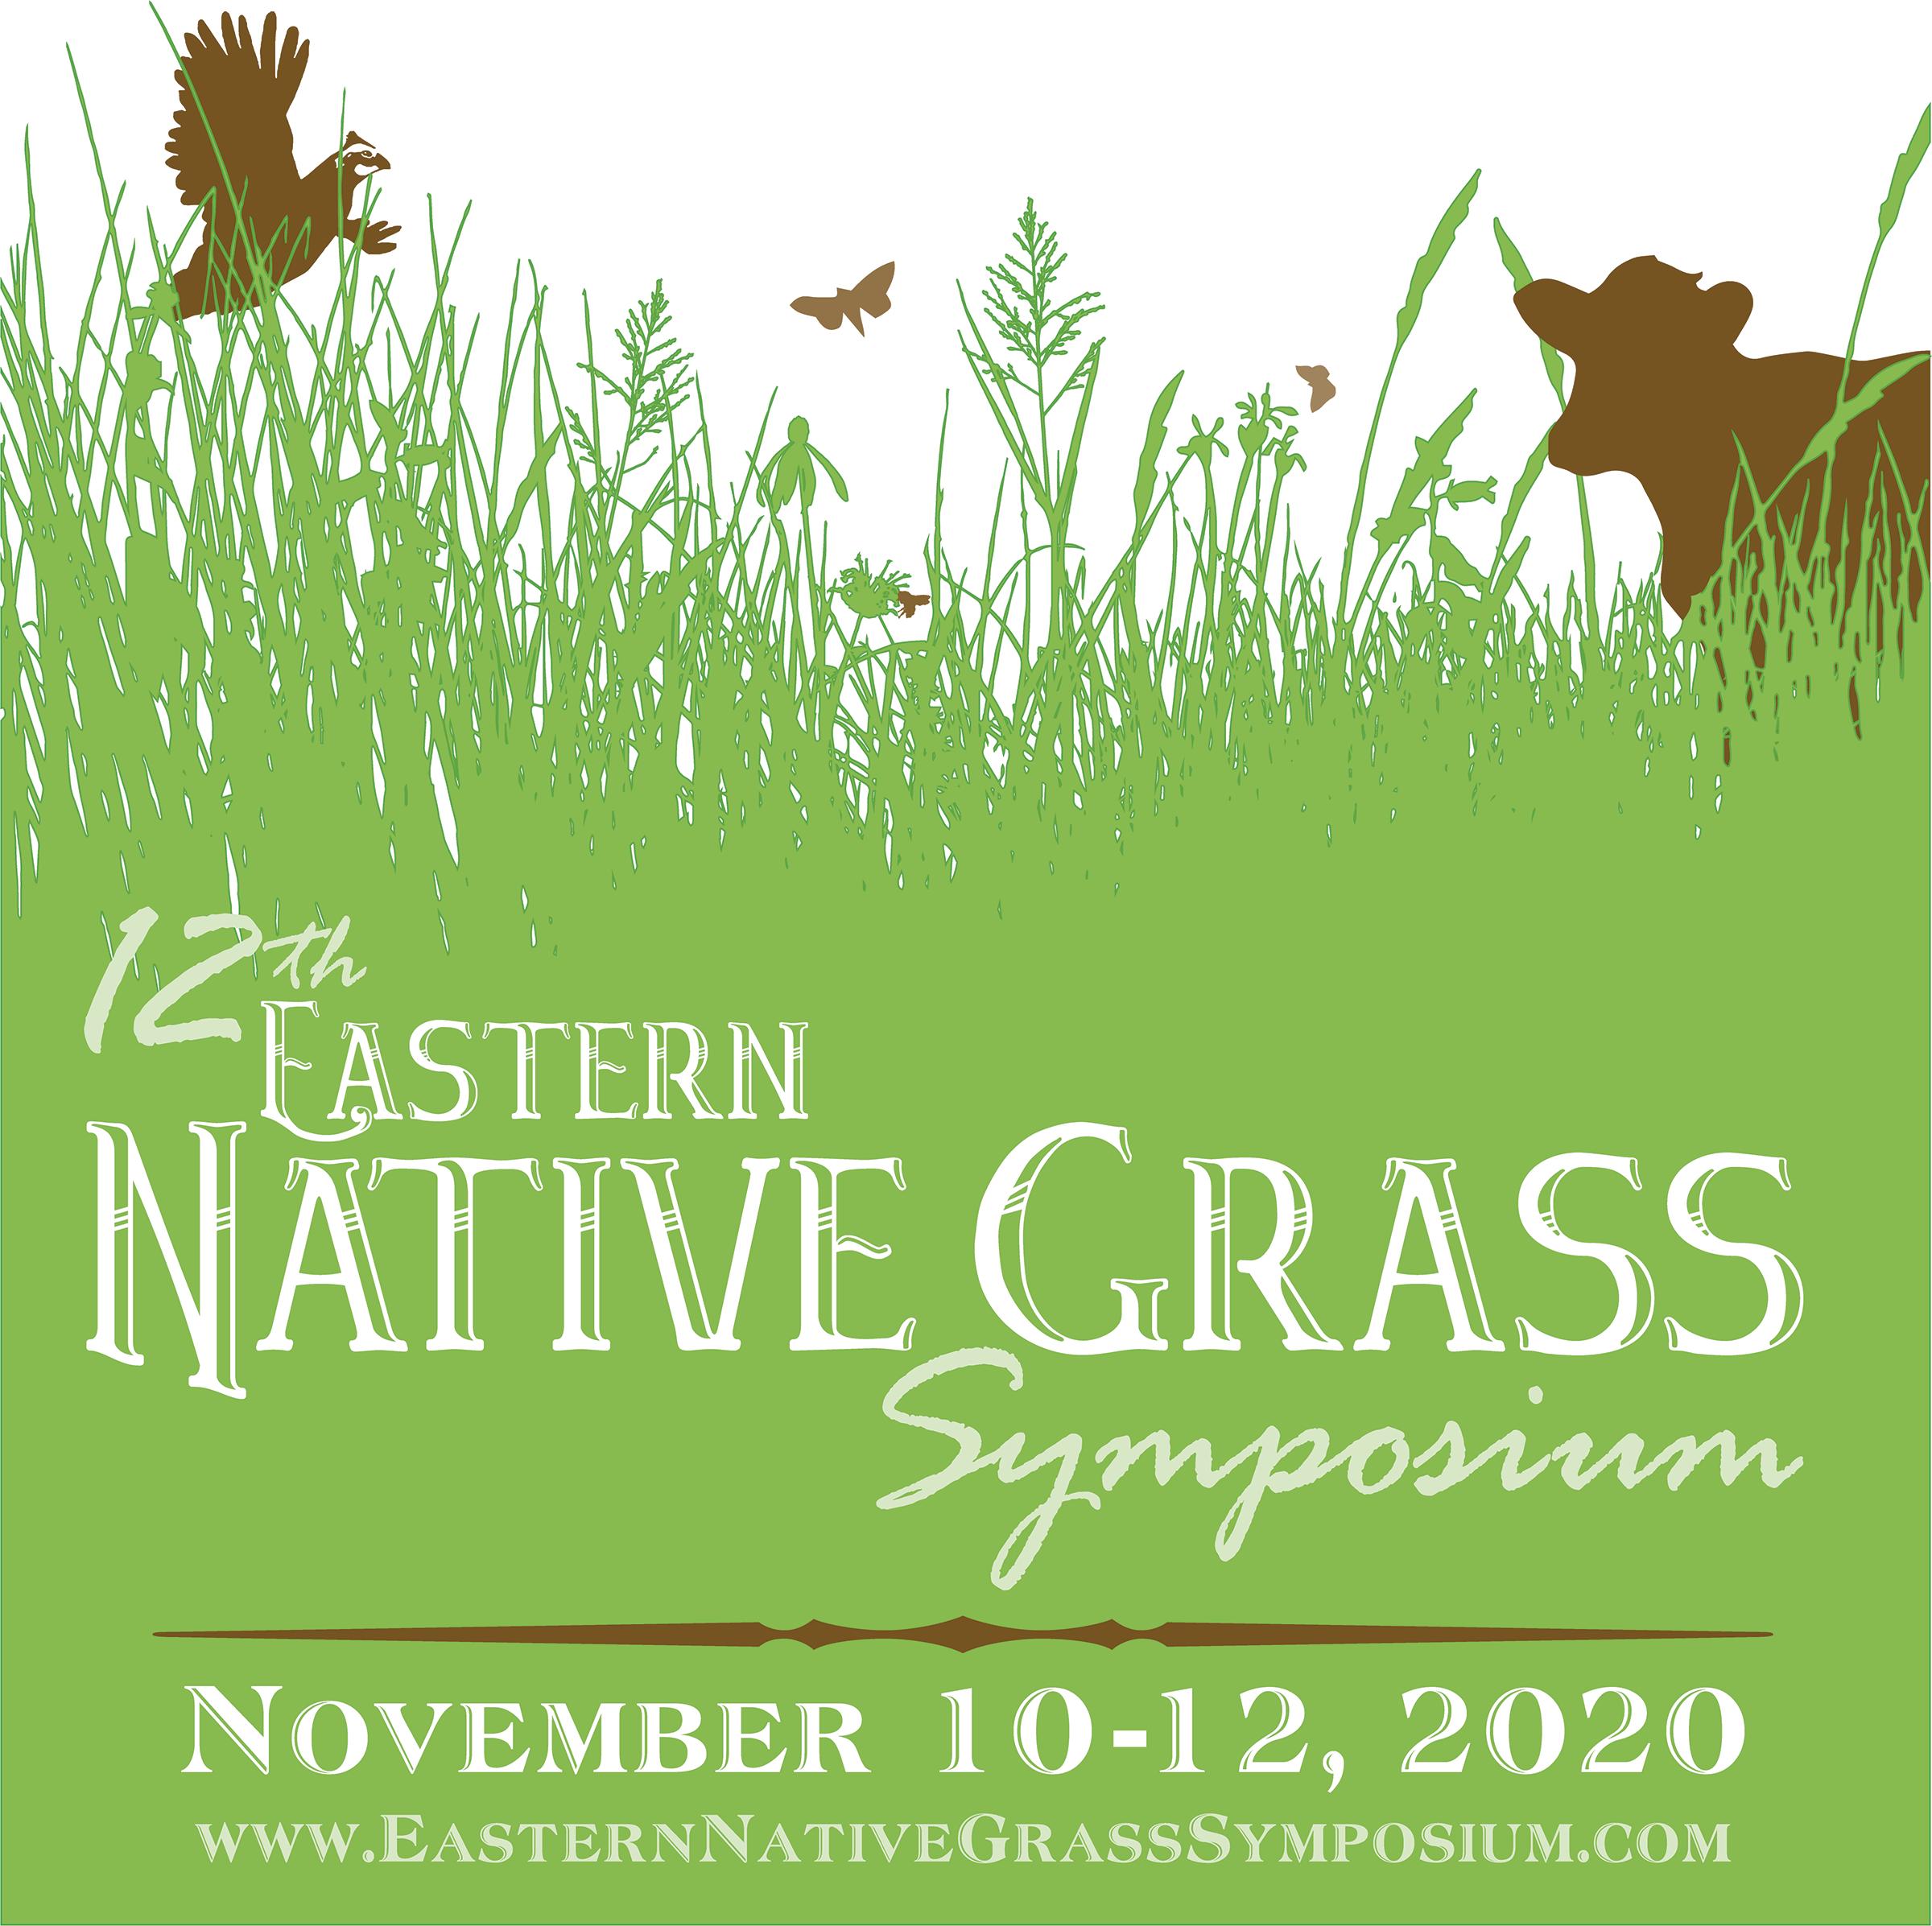 Eastern Native Grass Symposium